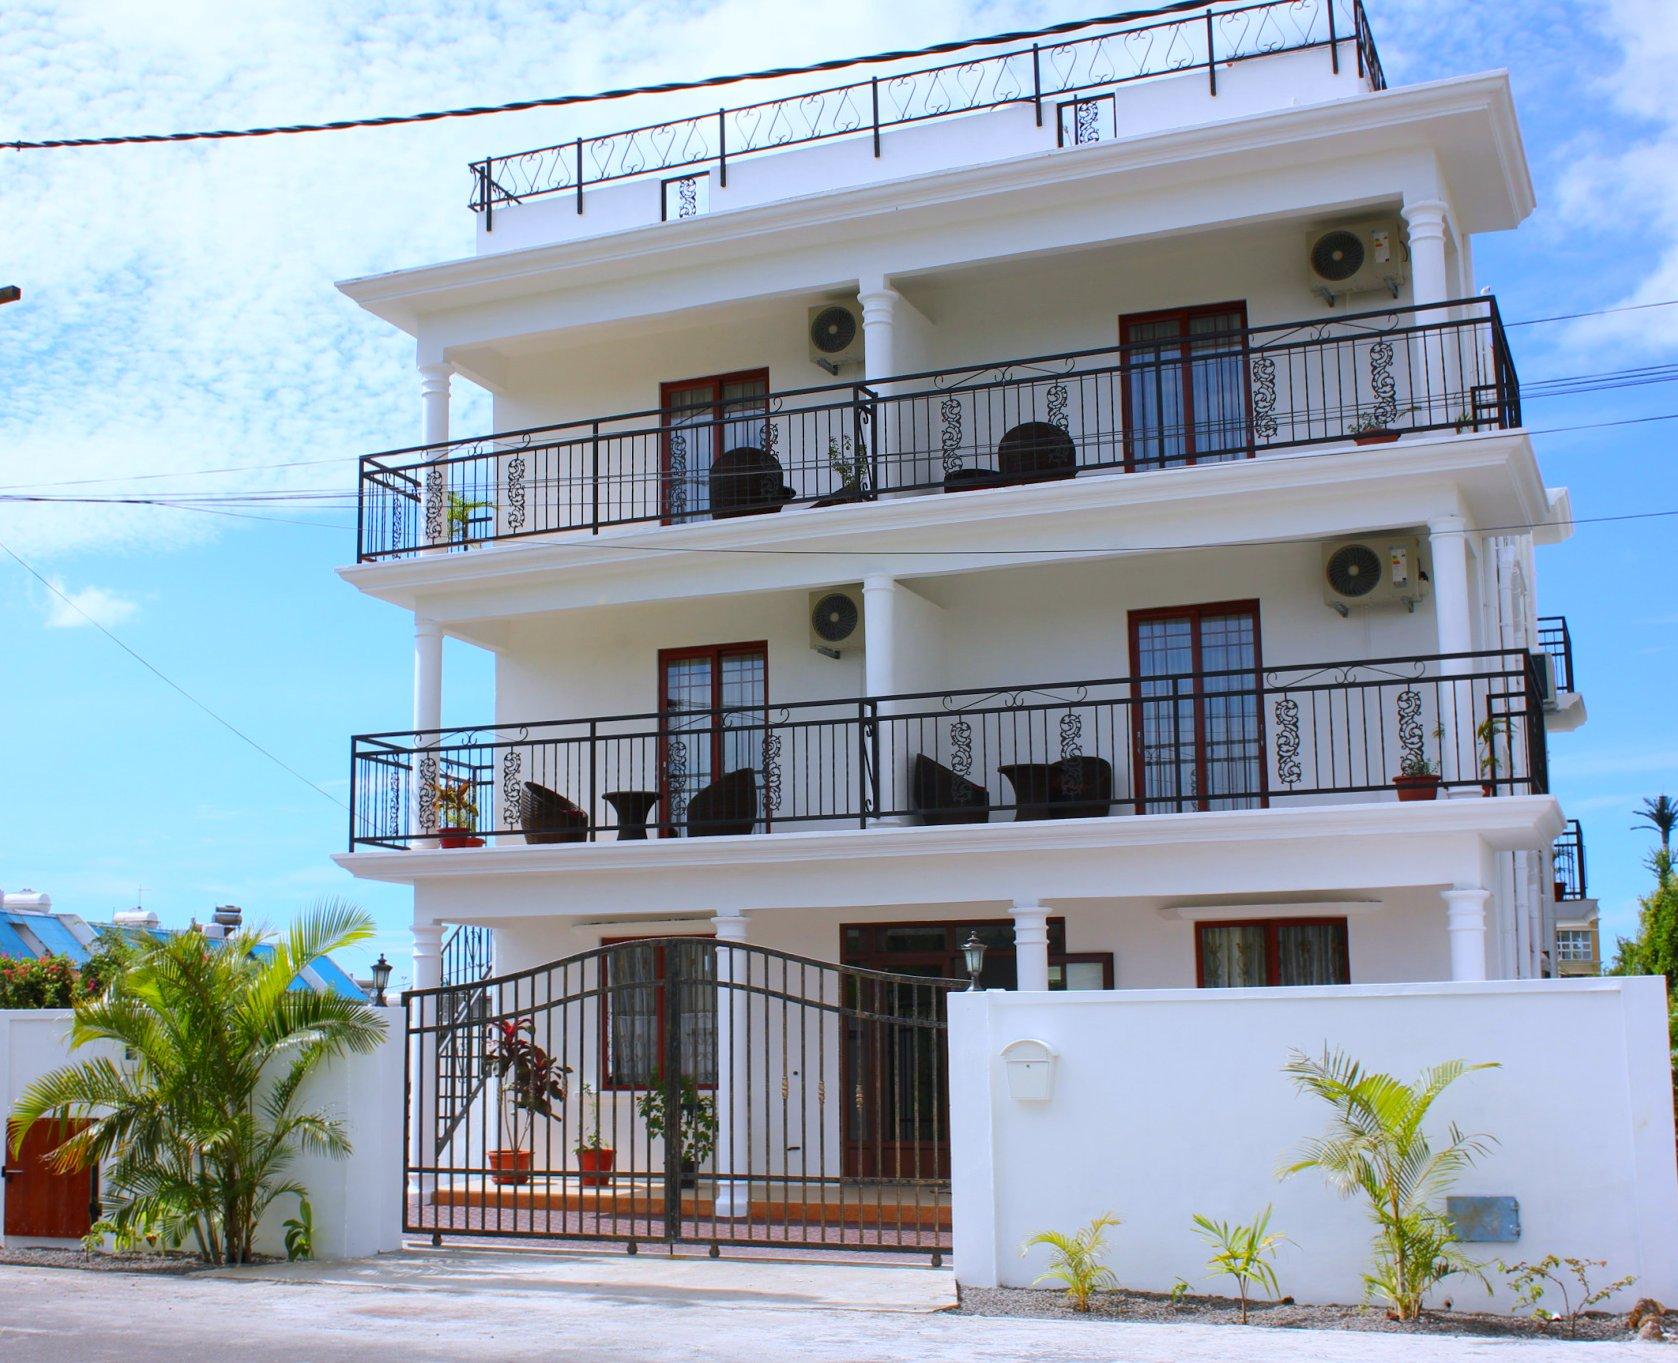 Maison ile maurice ventana blog for Acheter une maison a l ile maurice